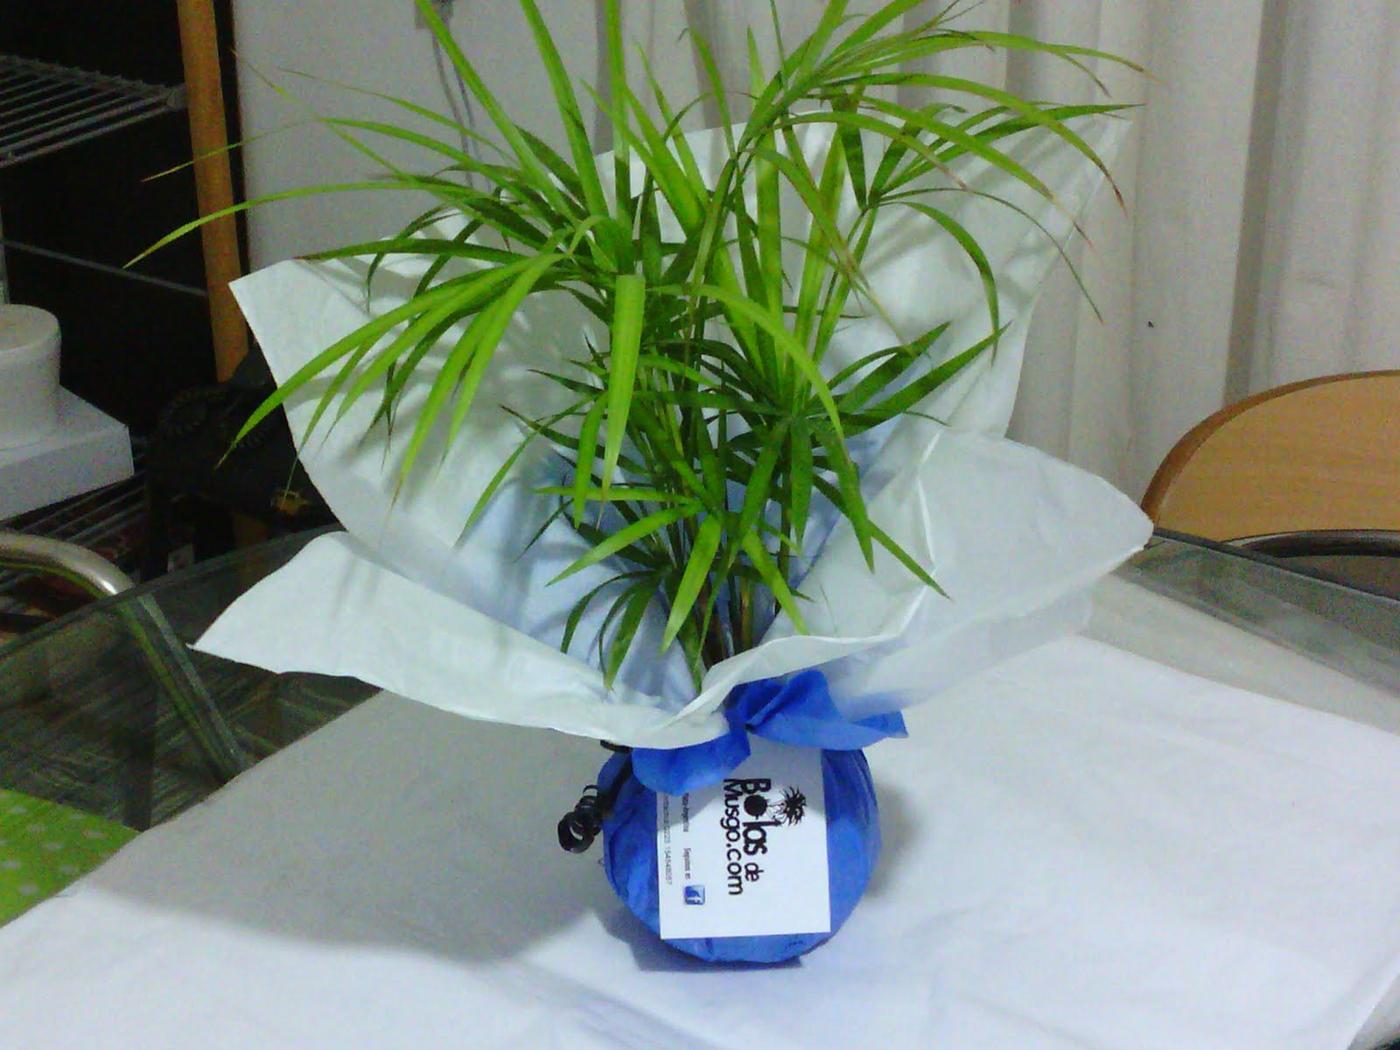 Bolas de musgo mar del plata argentina dise o - Plantas ornamentales de interior ...